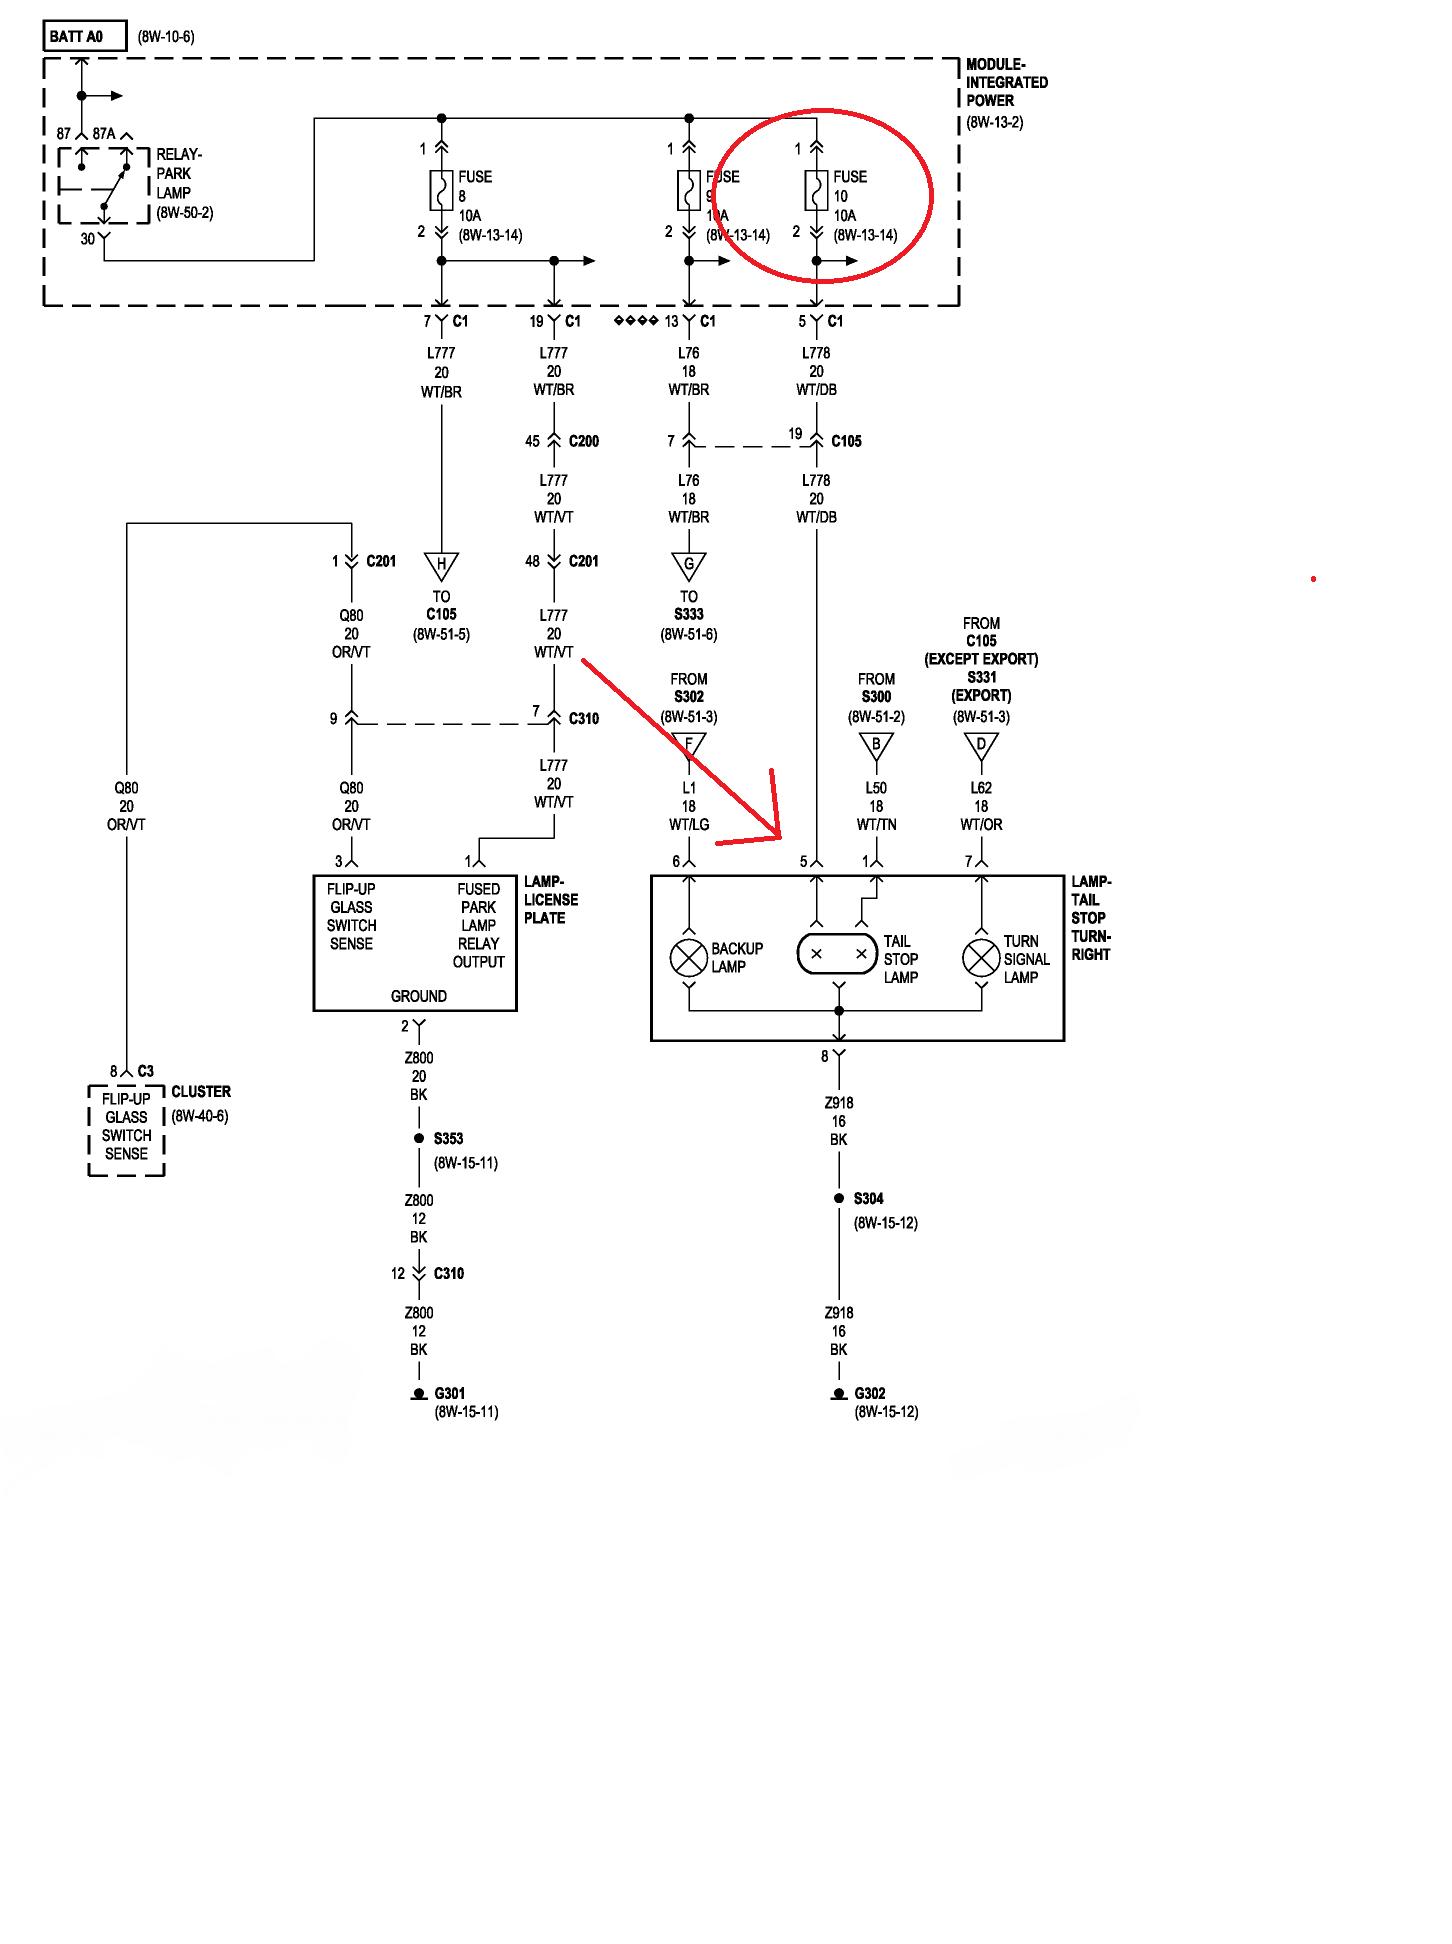 2005 Jeep Grand Cherokee Fuse Diagram Jeep Grand Cherokee Questions Right Tail Light Fuse Diagram Jeep